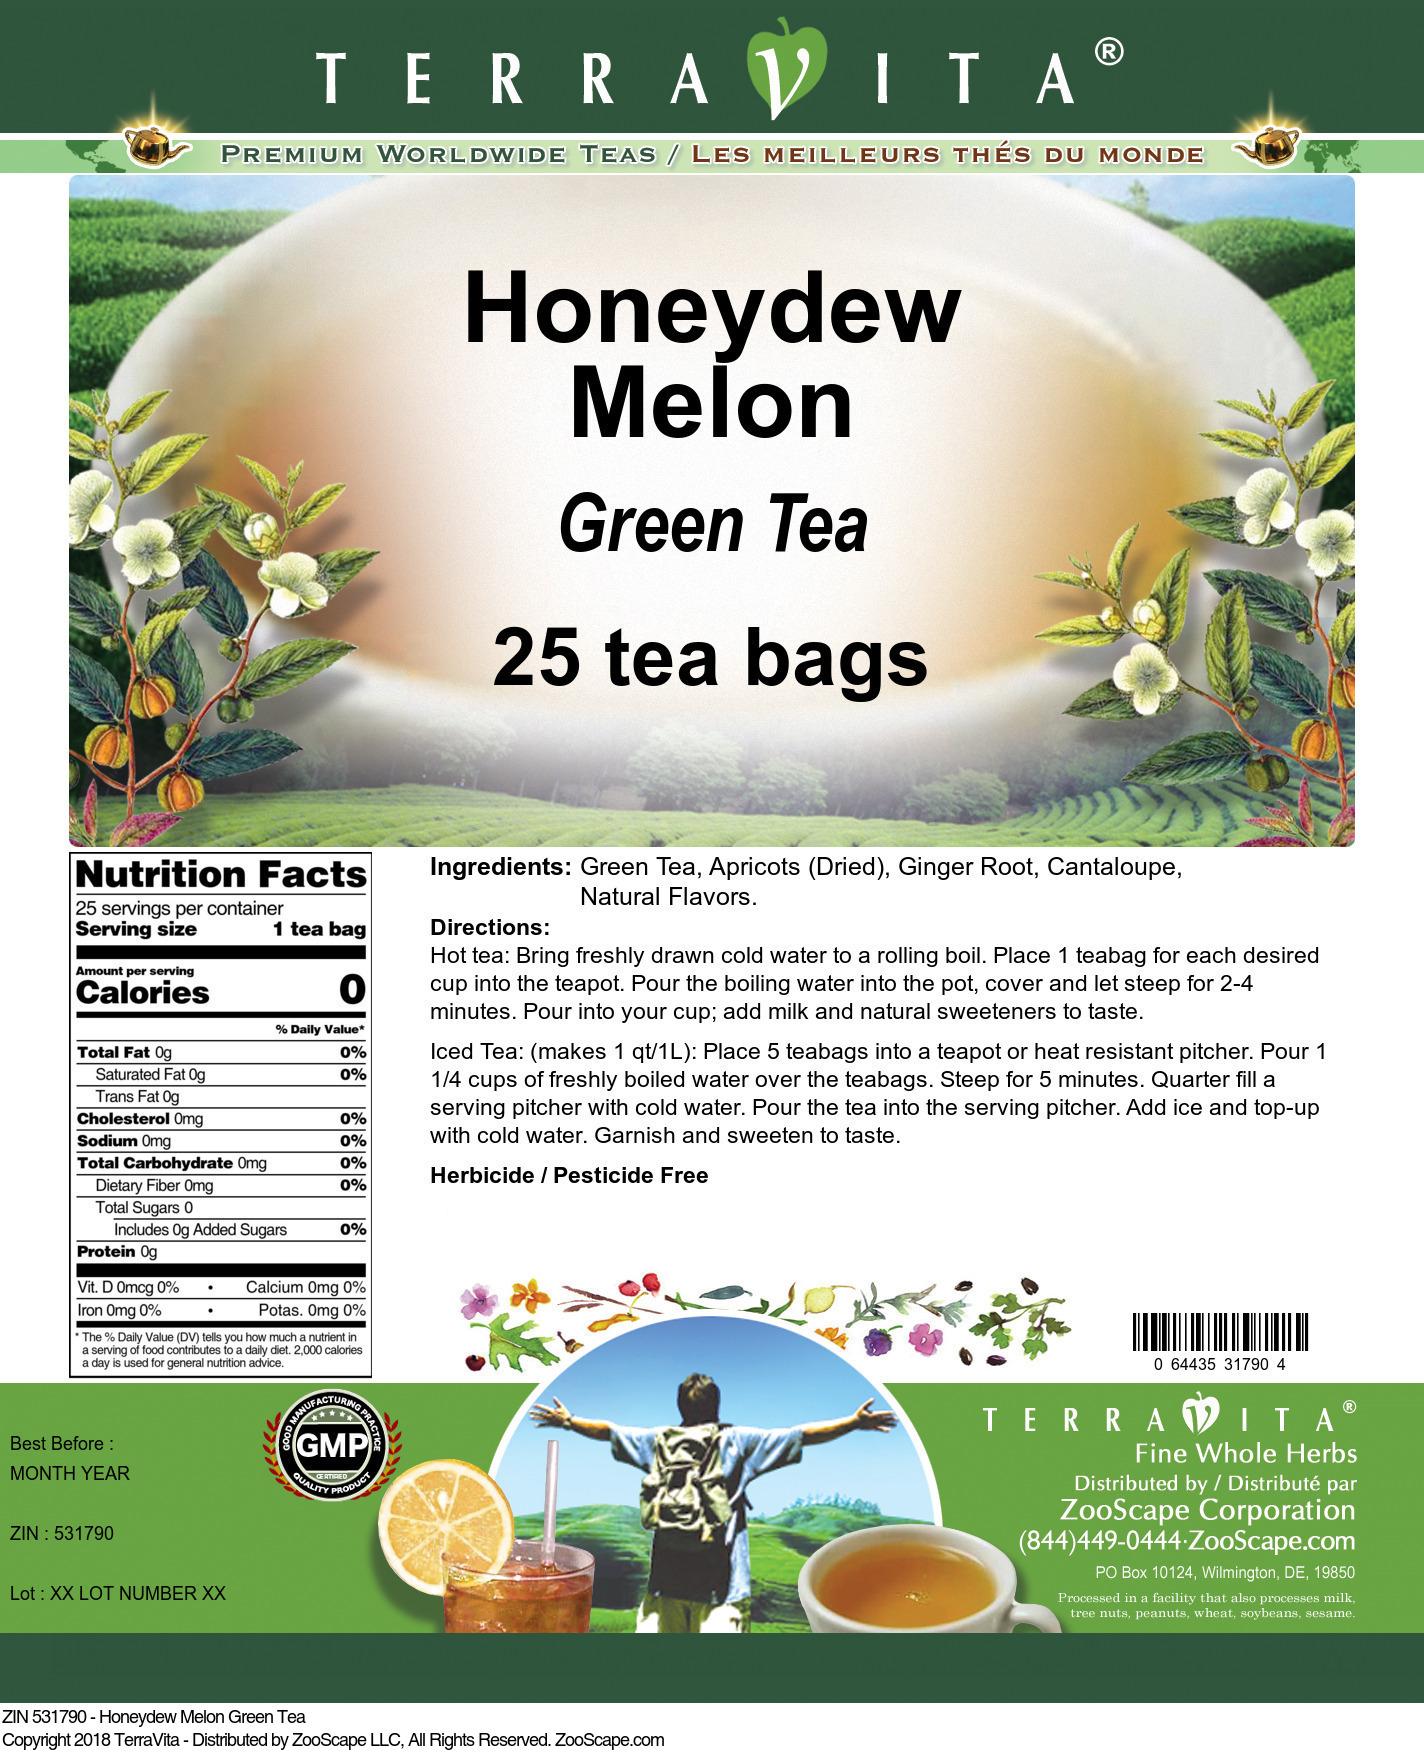 Honeydew Melon Green Tea